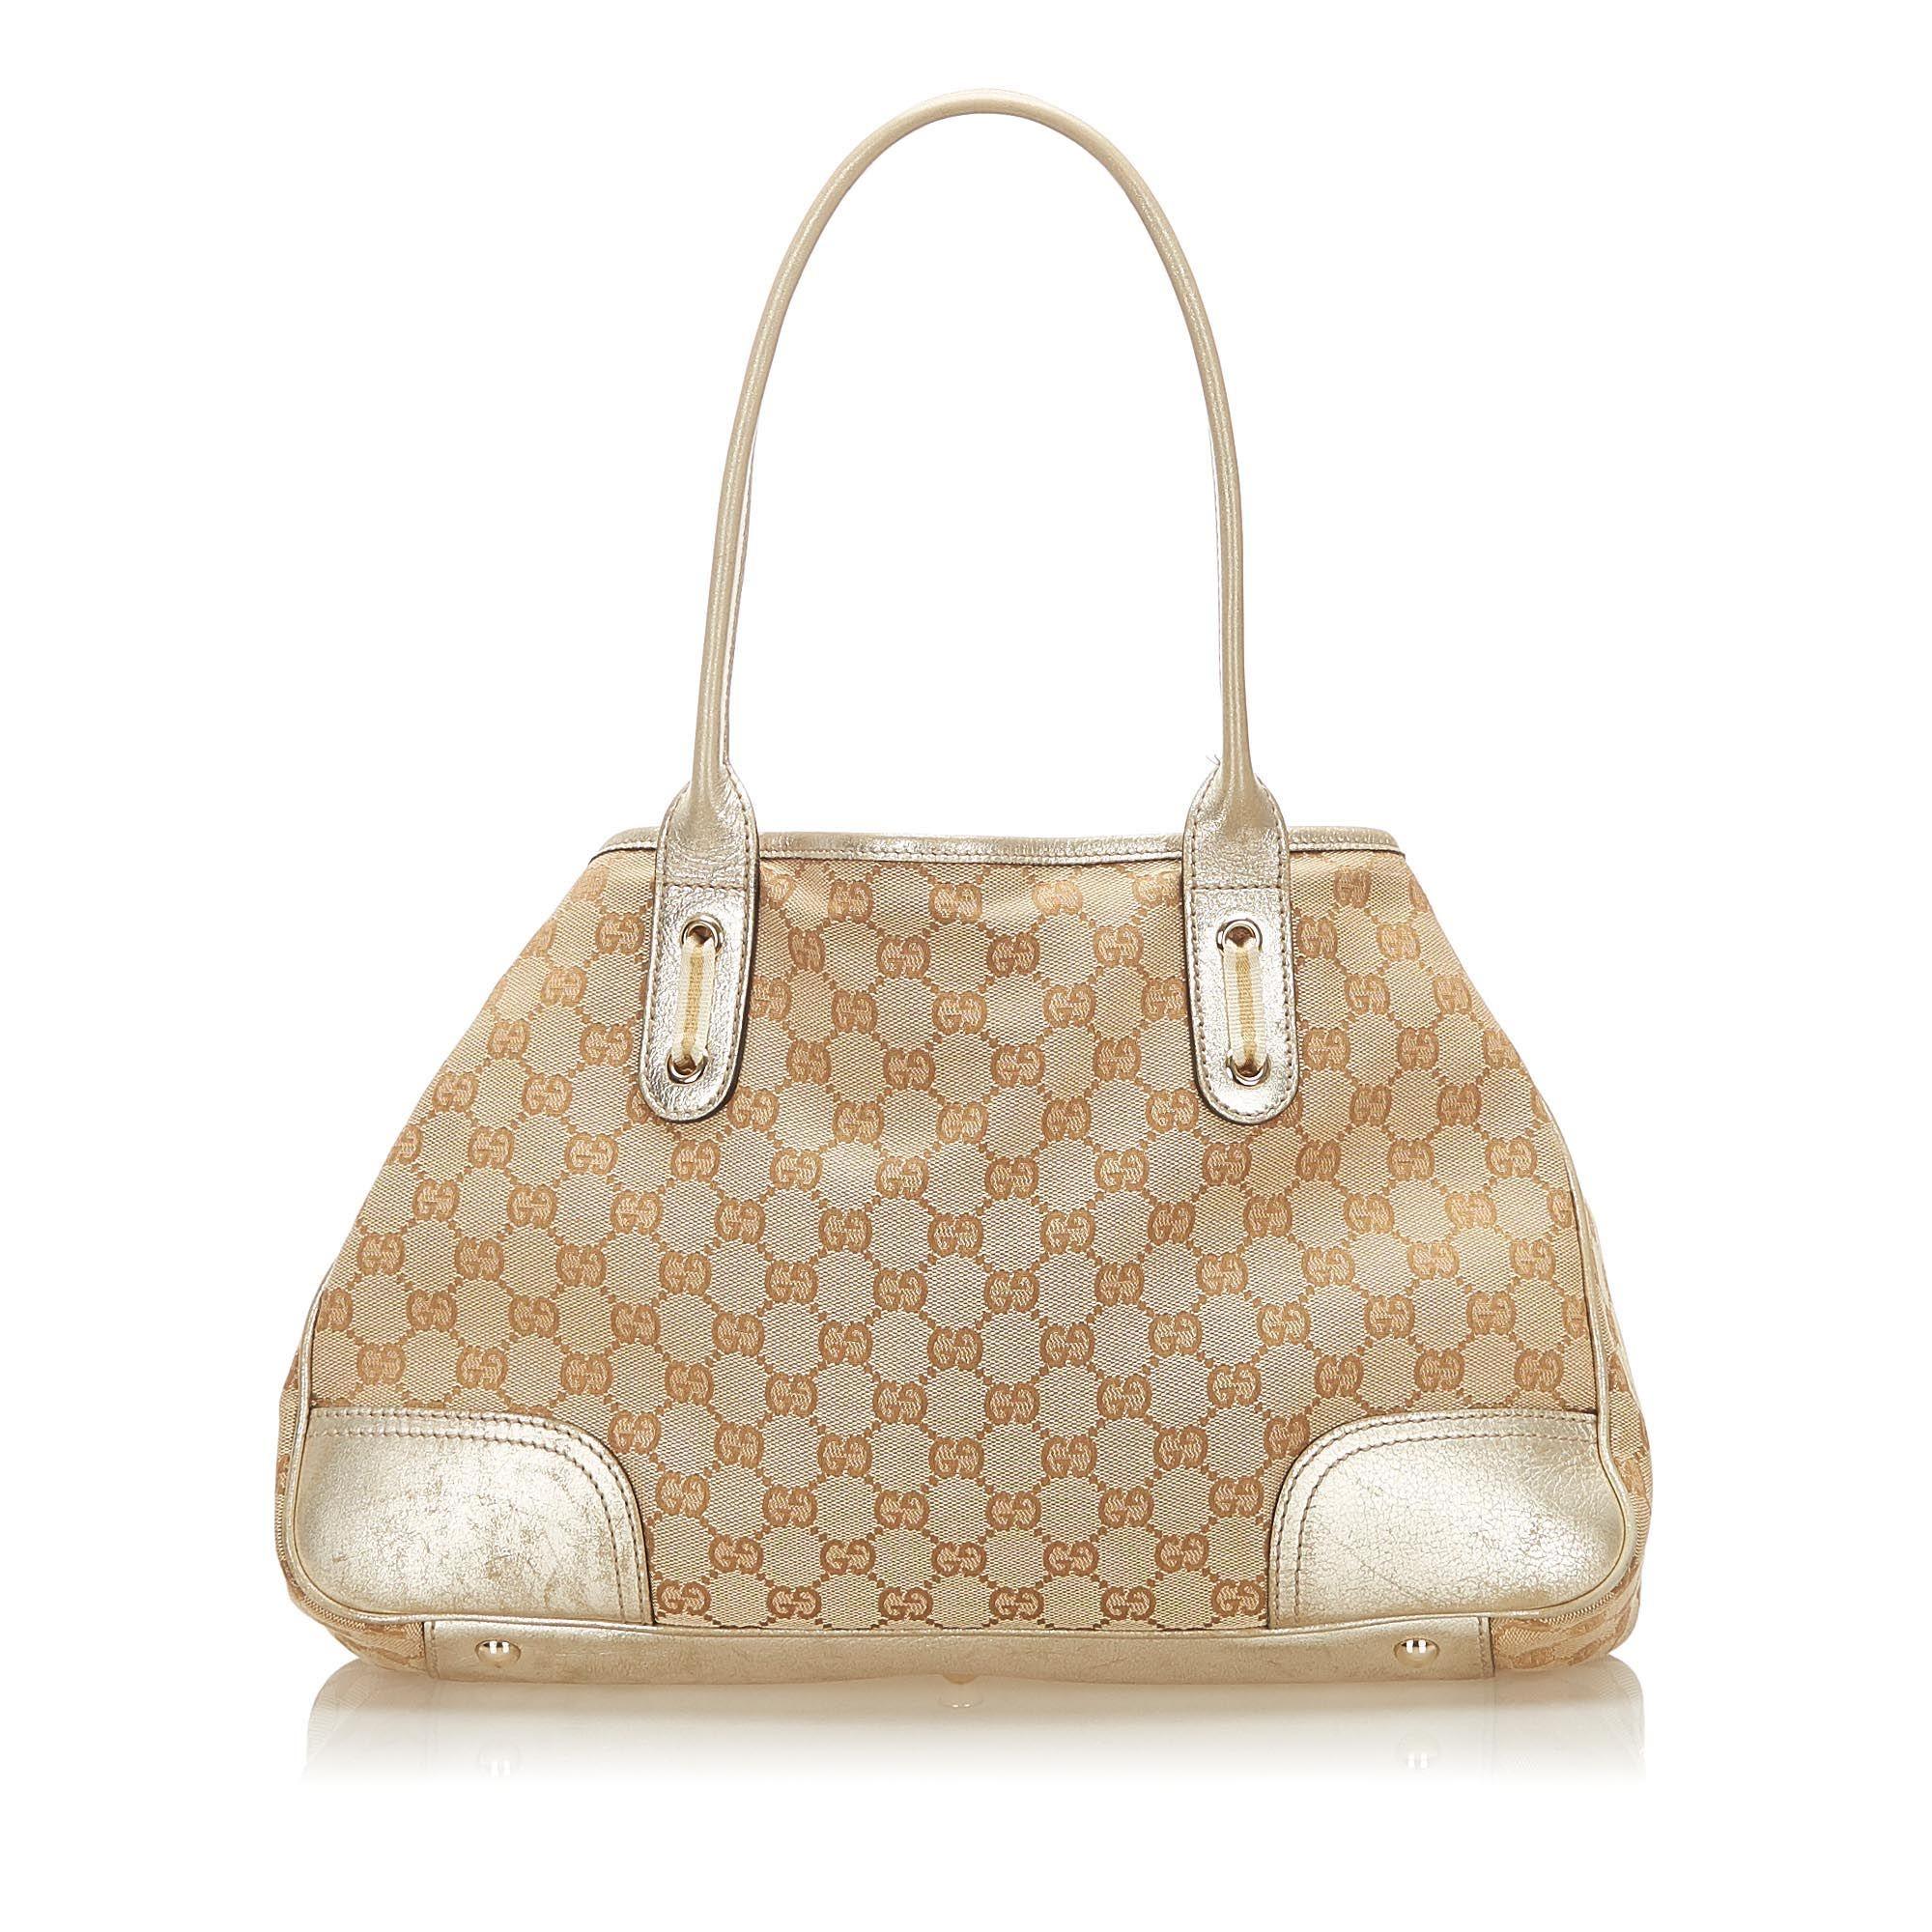 Vintage Gucci GG Canvas Princy Tote Bag Brown